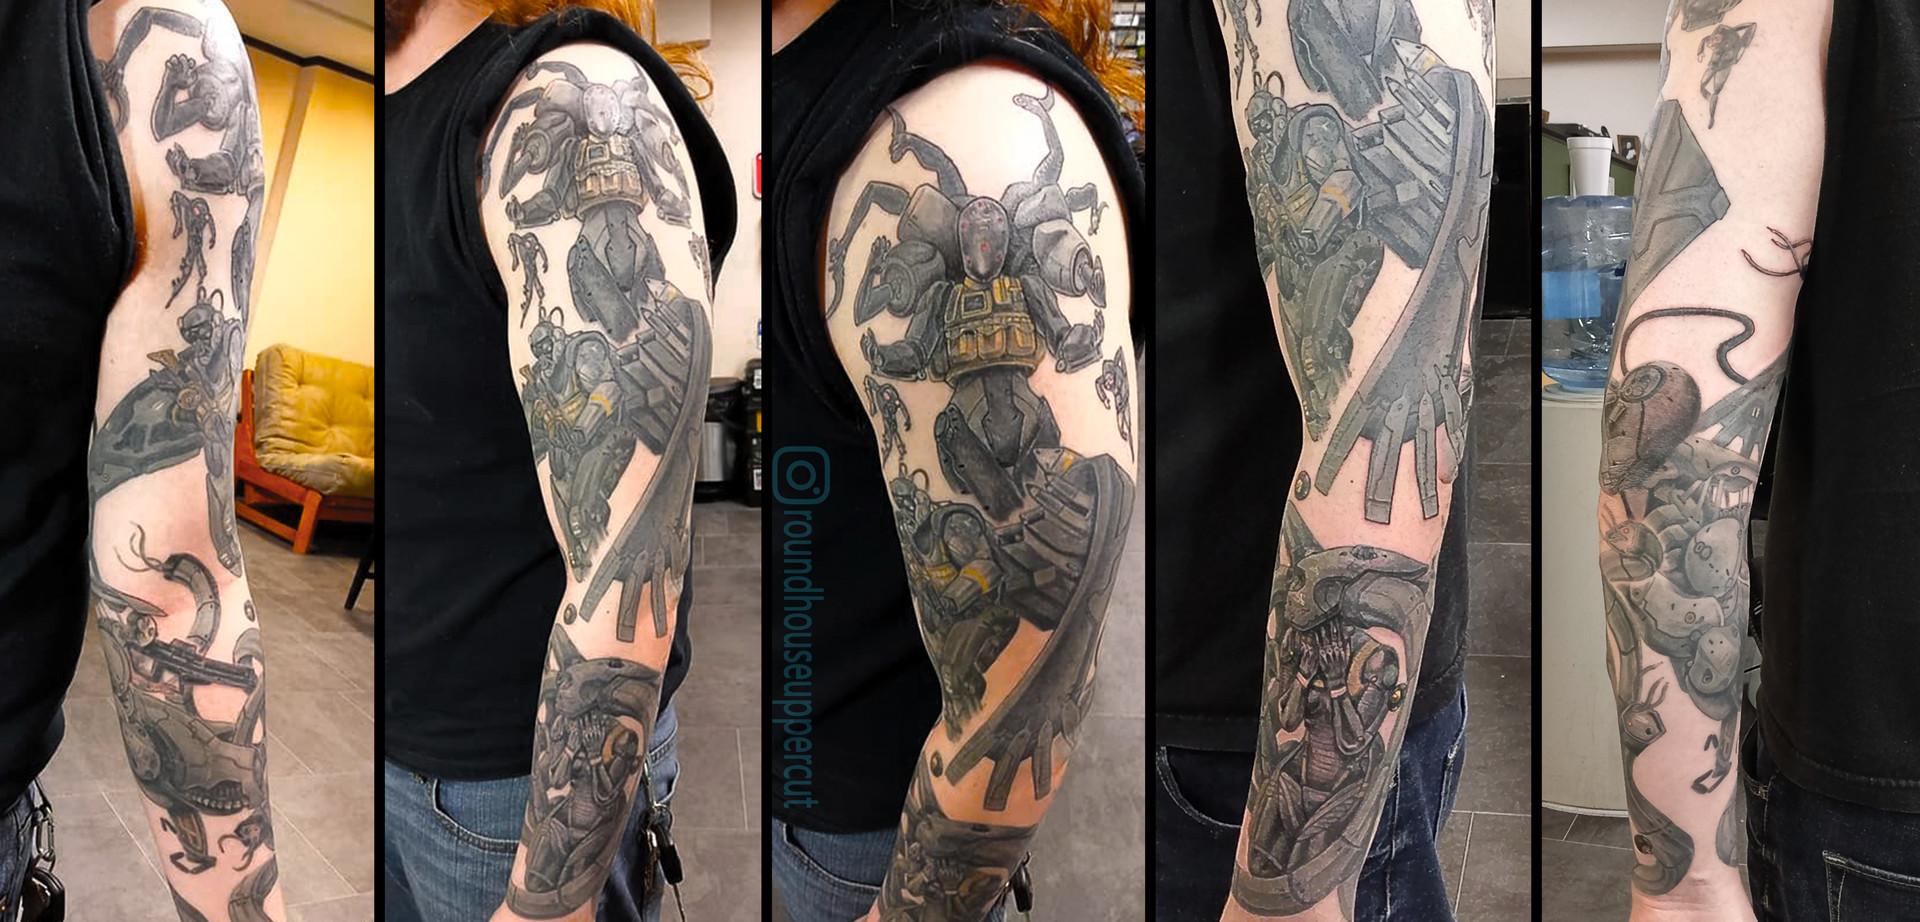 Artstation Metal Gear Solid 4 Tattoo Sleeve J All Day